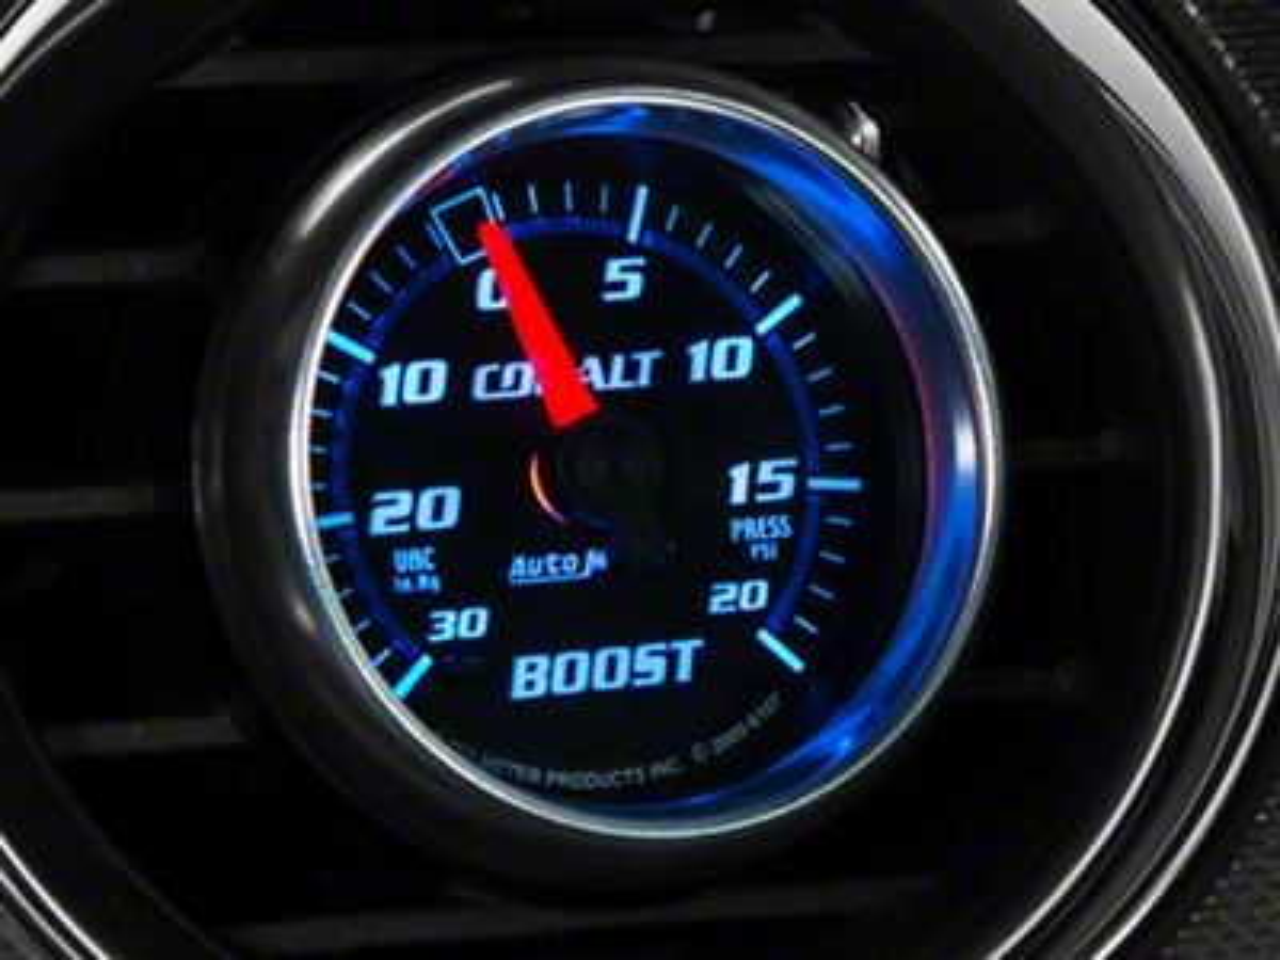 Auto Meter Cobalt 20 PSI Boost/Vac Gauge - Mechanical (08-19 All)